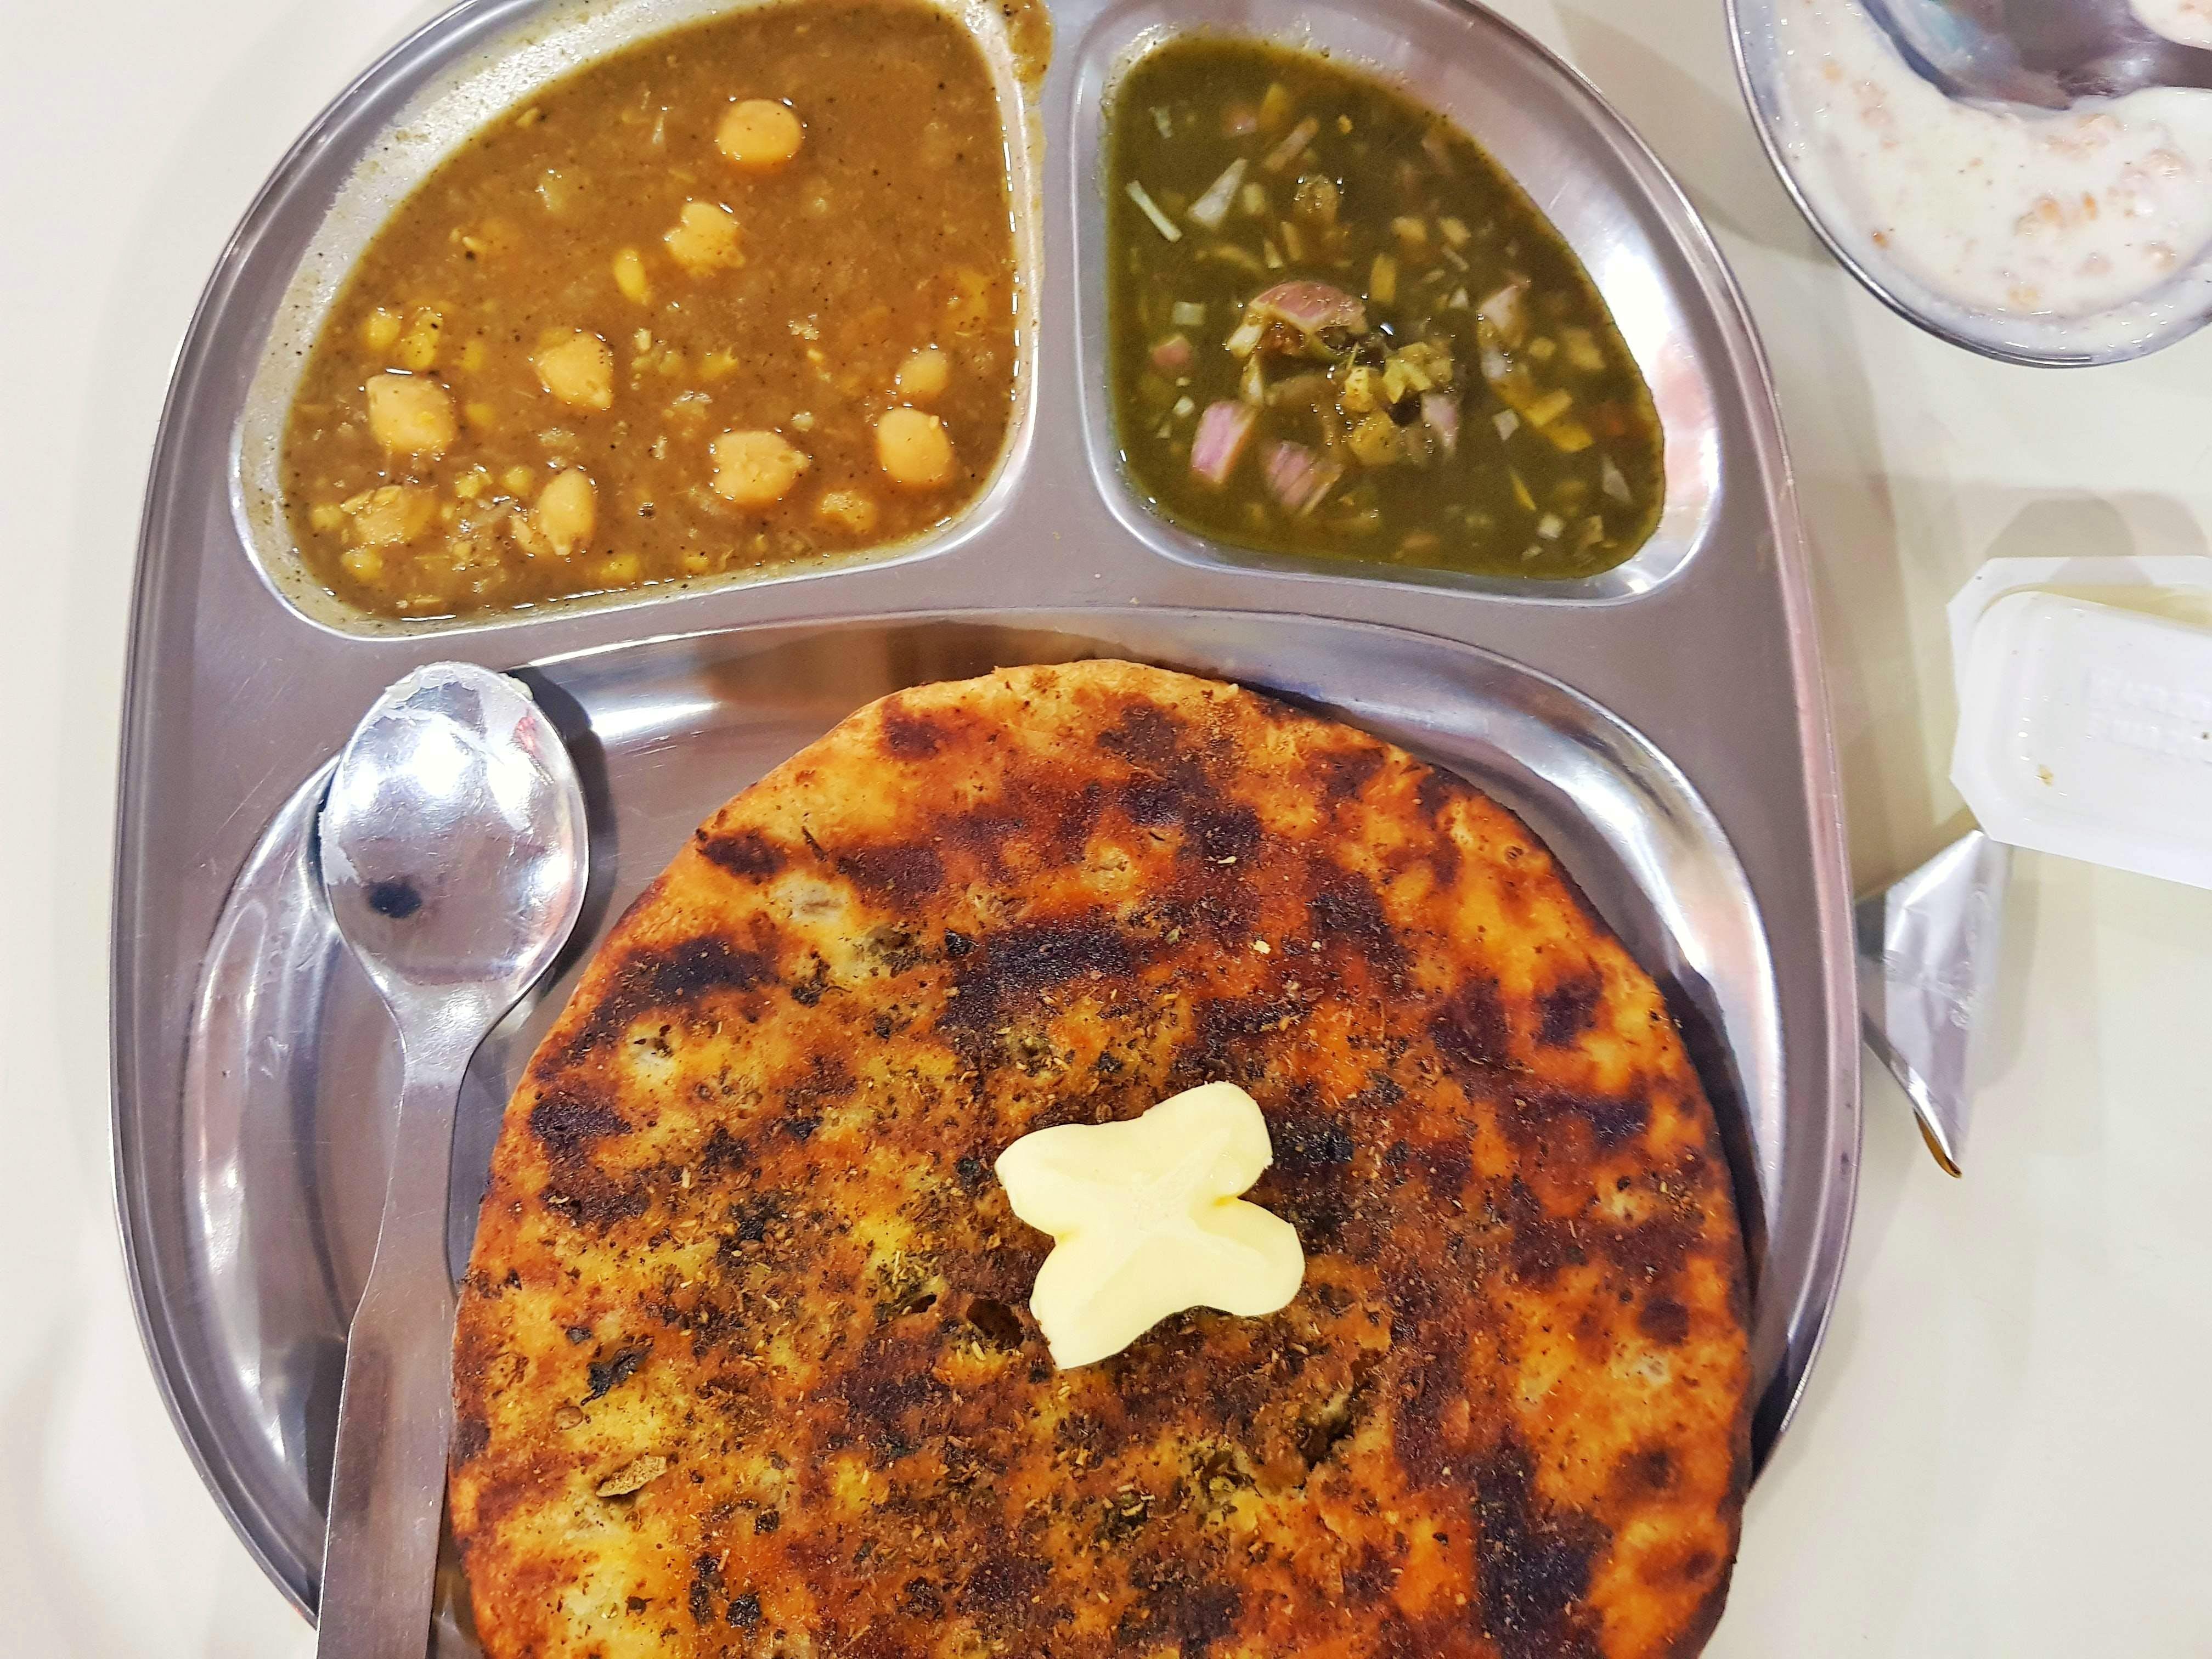 Dish,Food,Cuisine,Ingredient,Punjabi cuisine,Staple food,Bobotie,Indian cuisine,Produce,Lunch